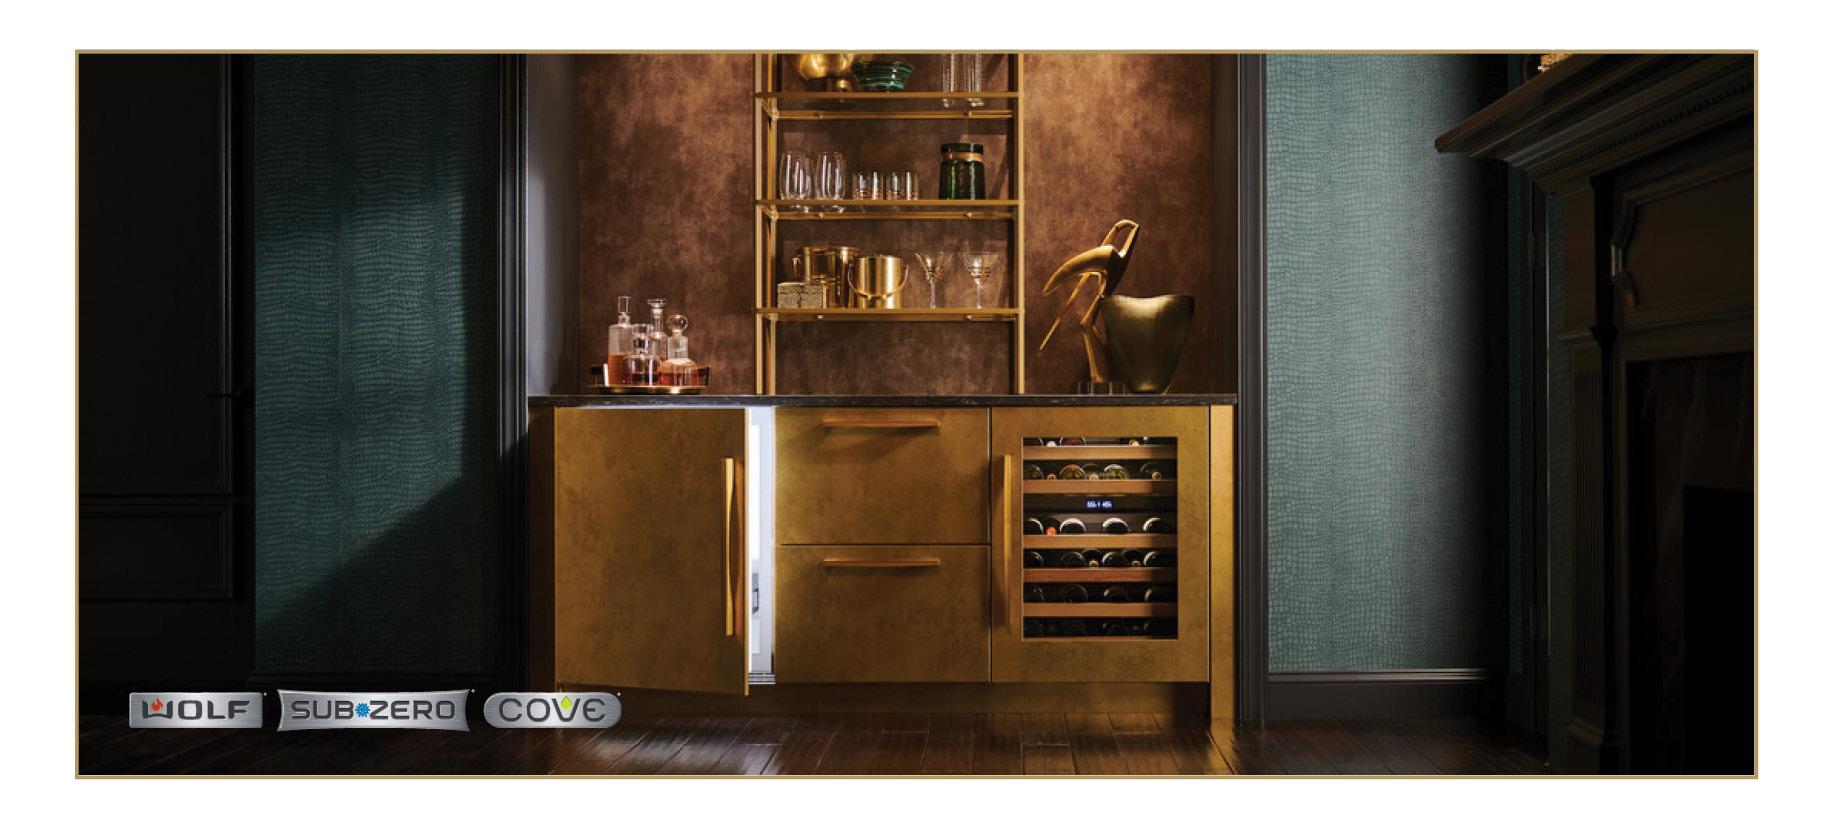 Sub-Zero Designer Series Undercounter Refrigerator